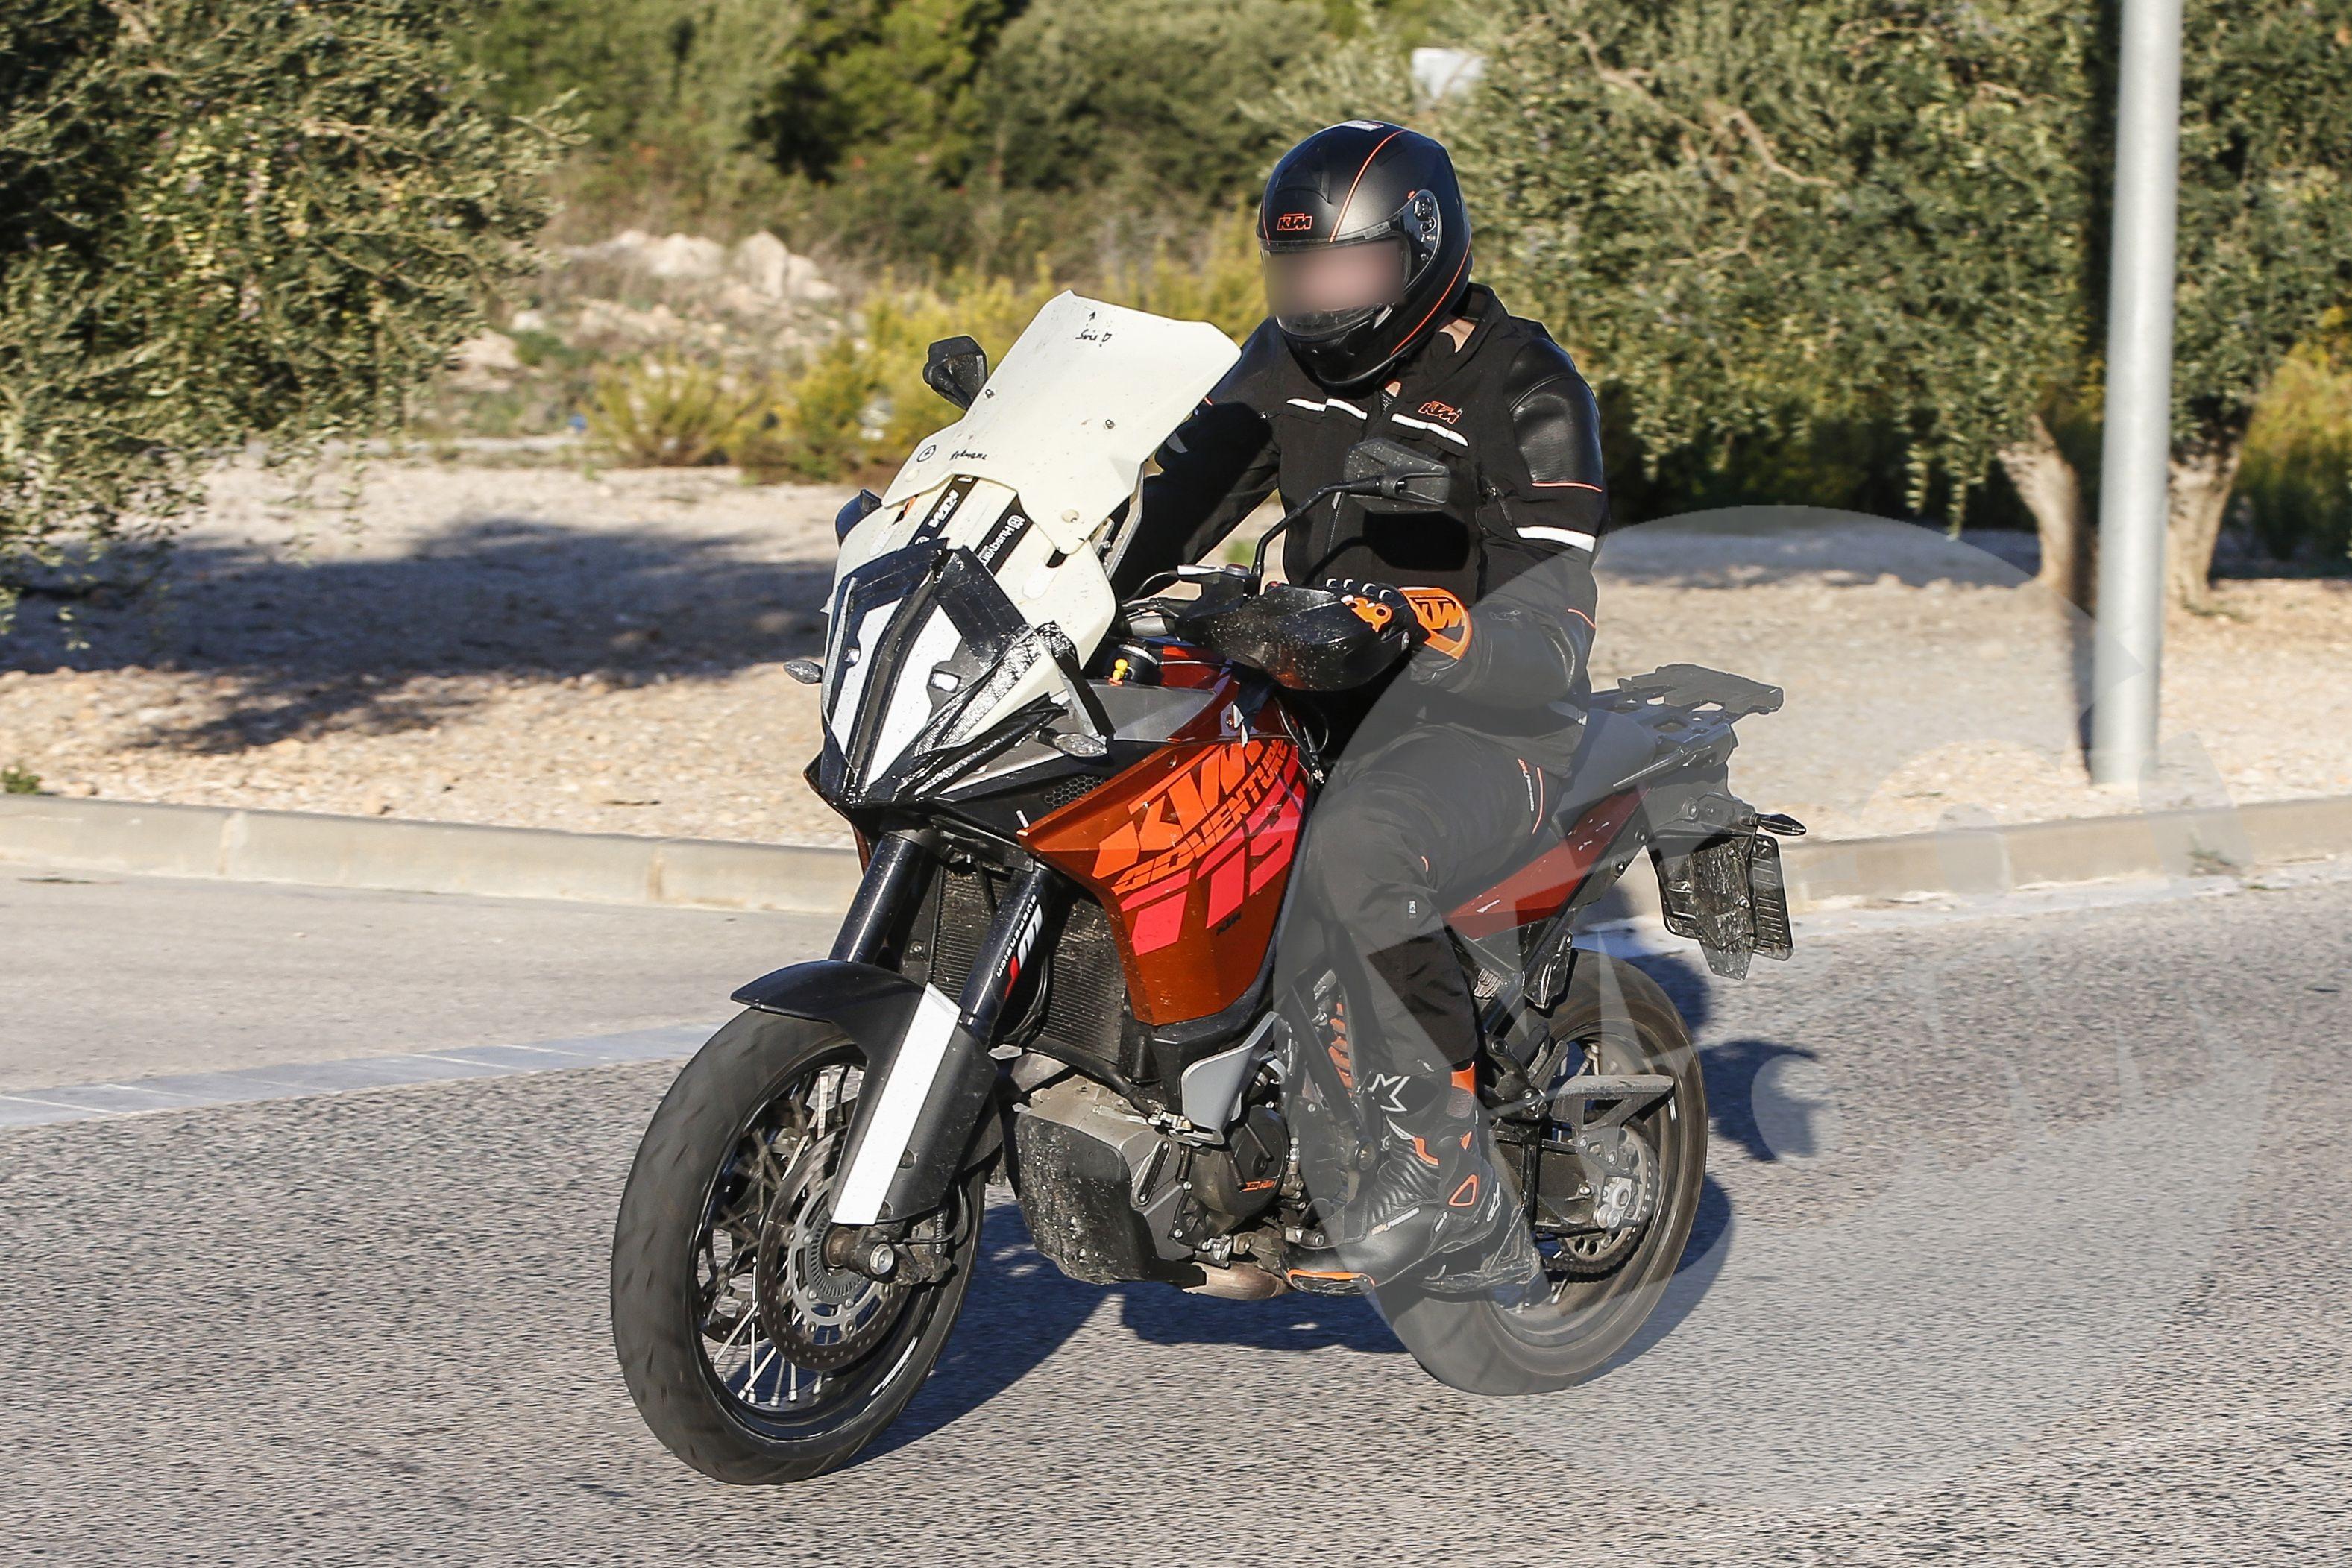 KTMの新型1190アドベンチャーの...